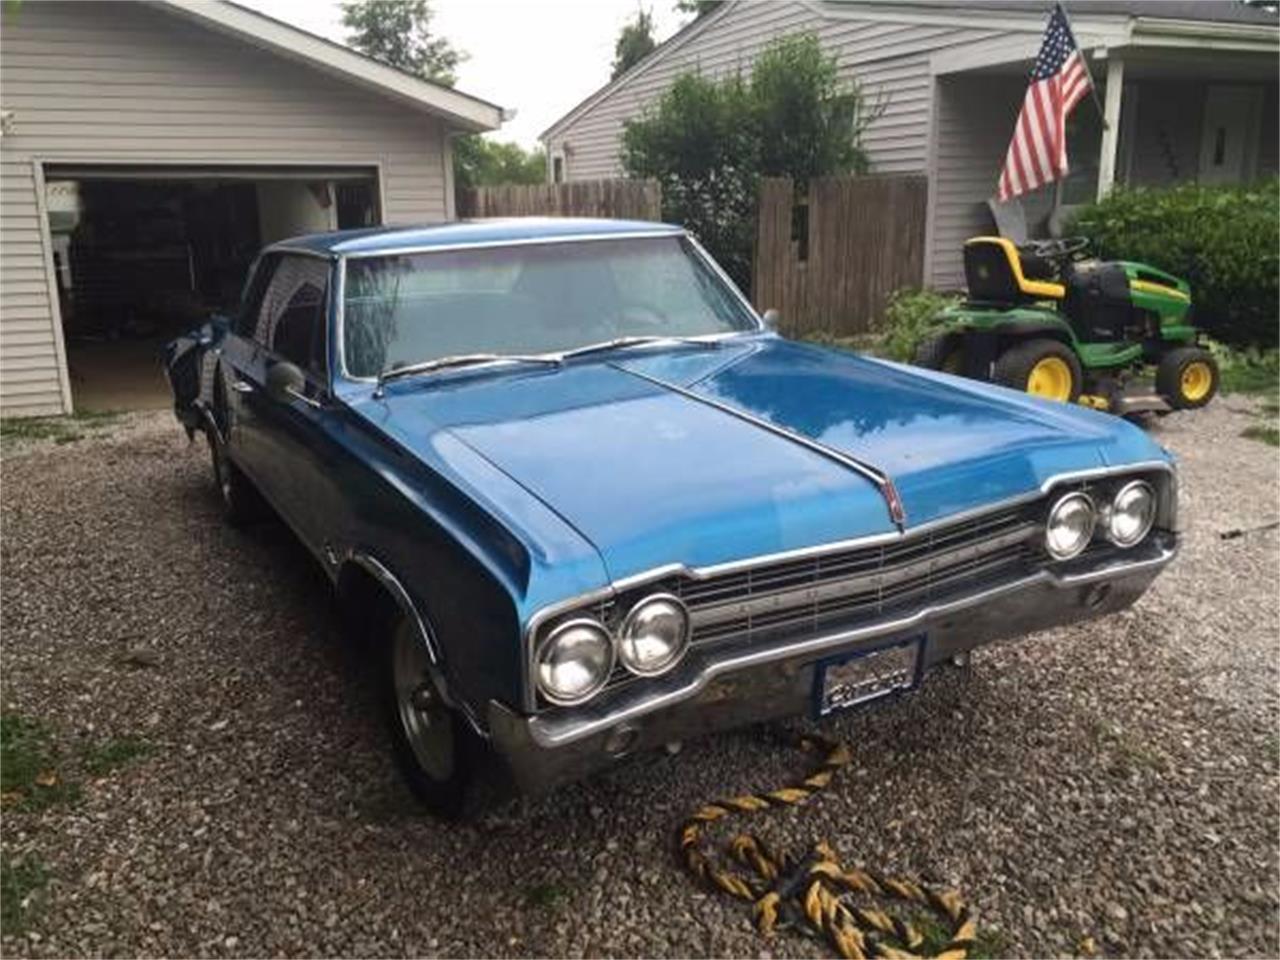 For Sale: 1965 Oldsmobile Cutlass in Cadillac, Michigan